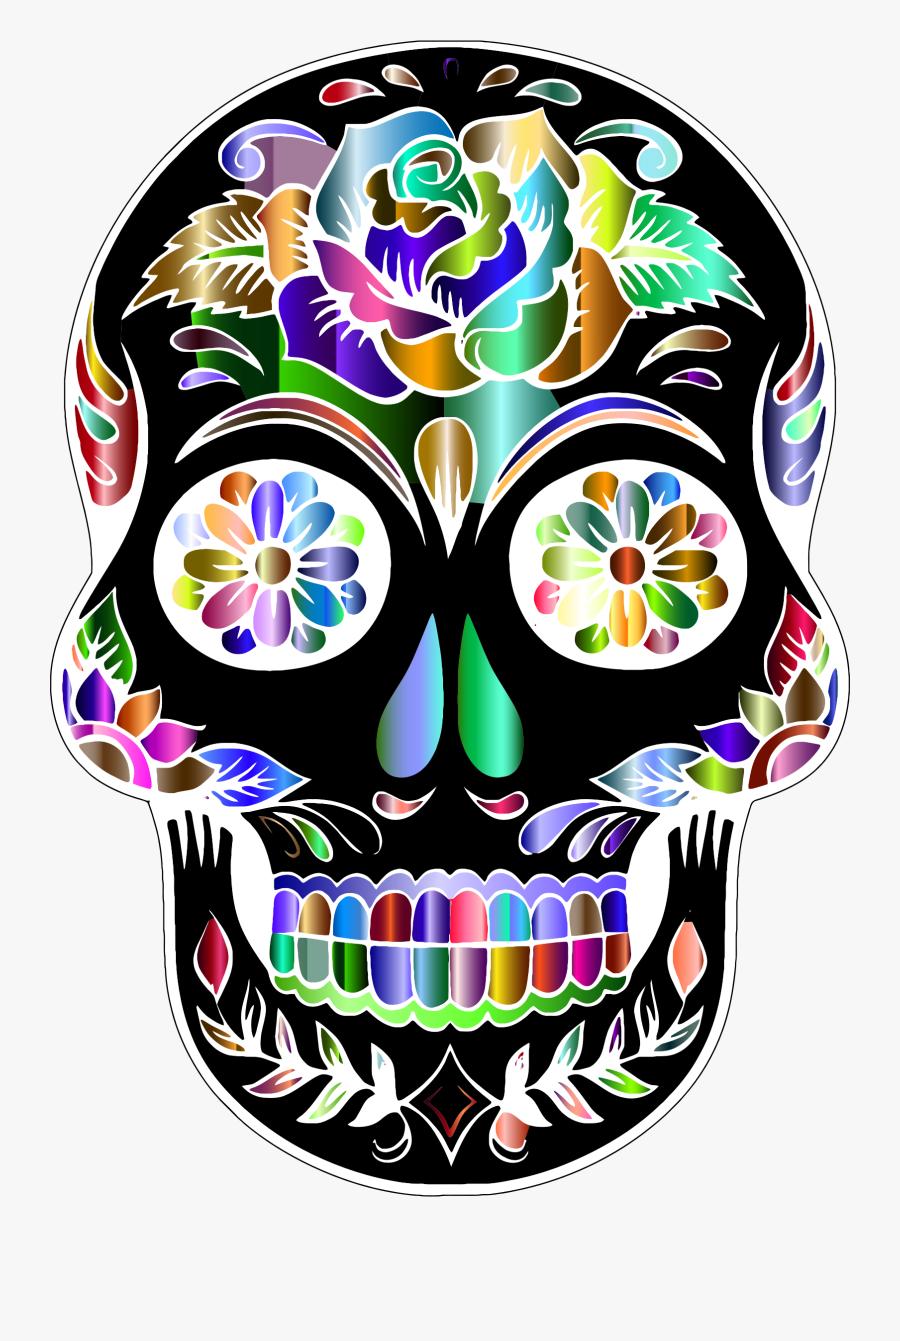 Sugar Skull Transparent Background - Sugar Skull No Background, Transparent Clipart